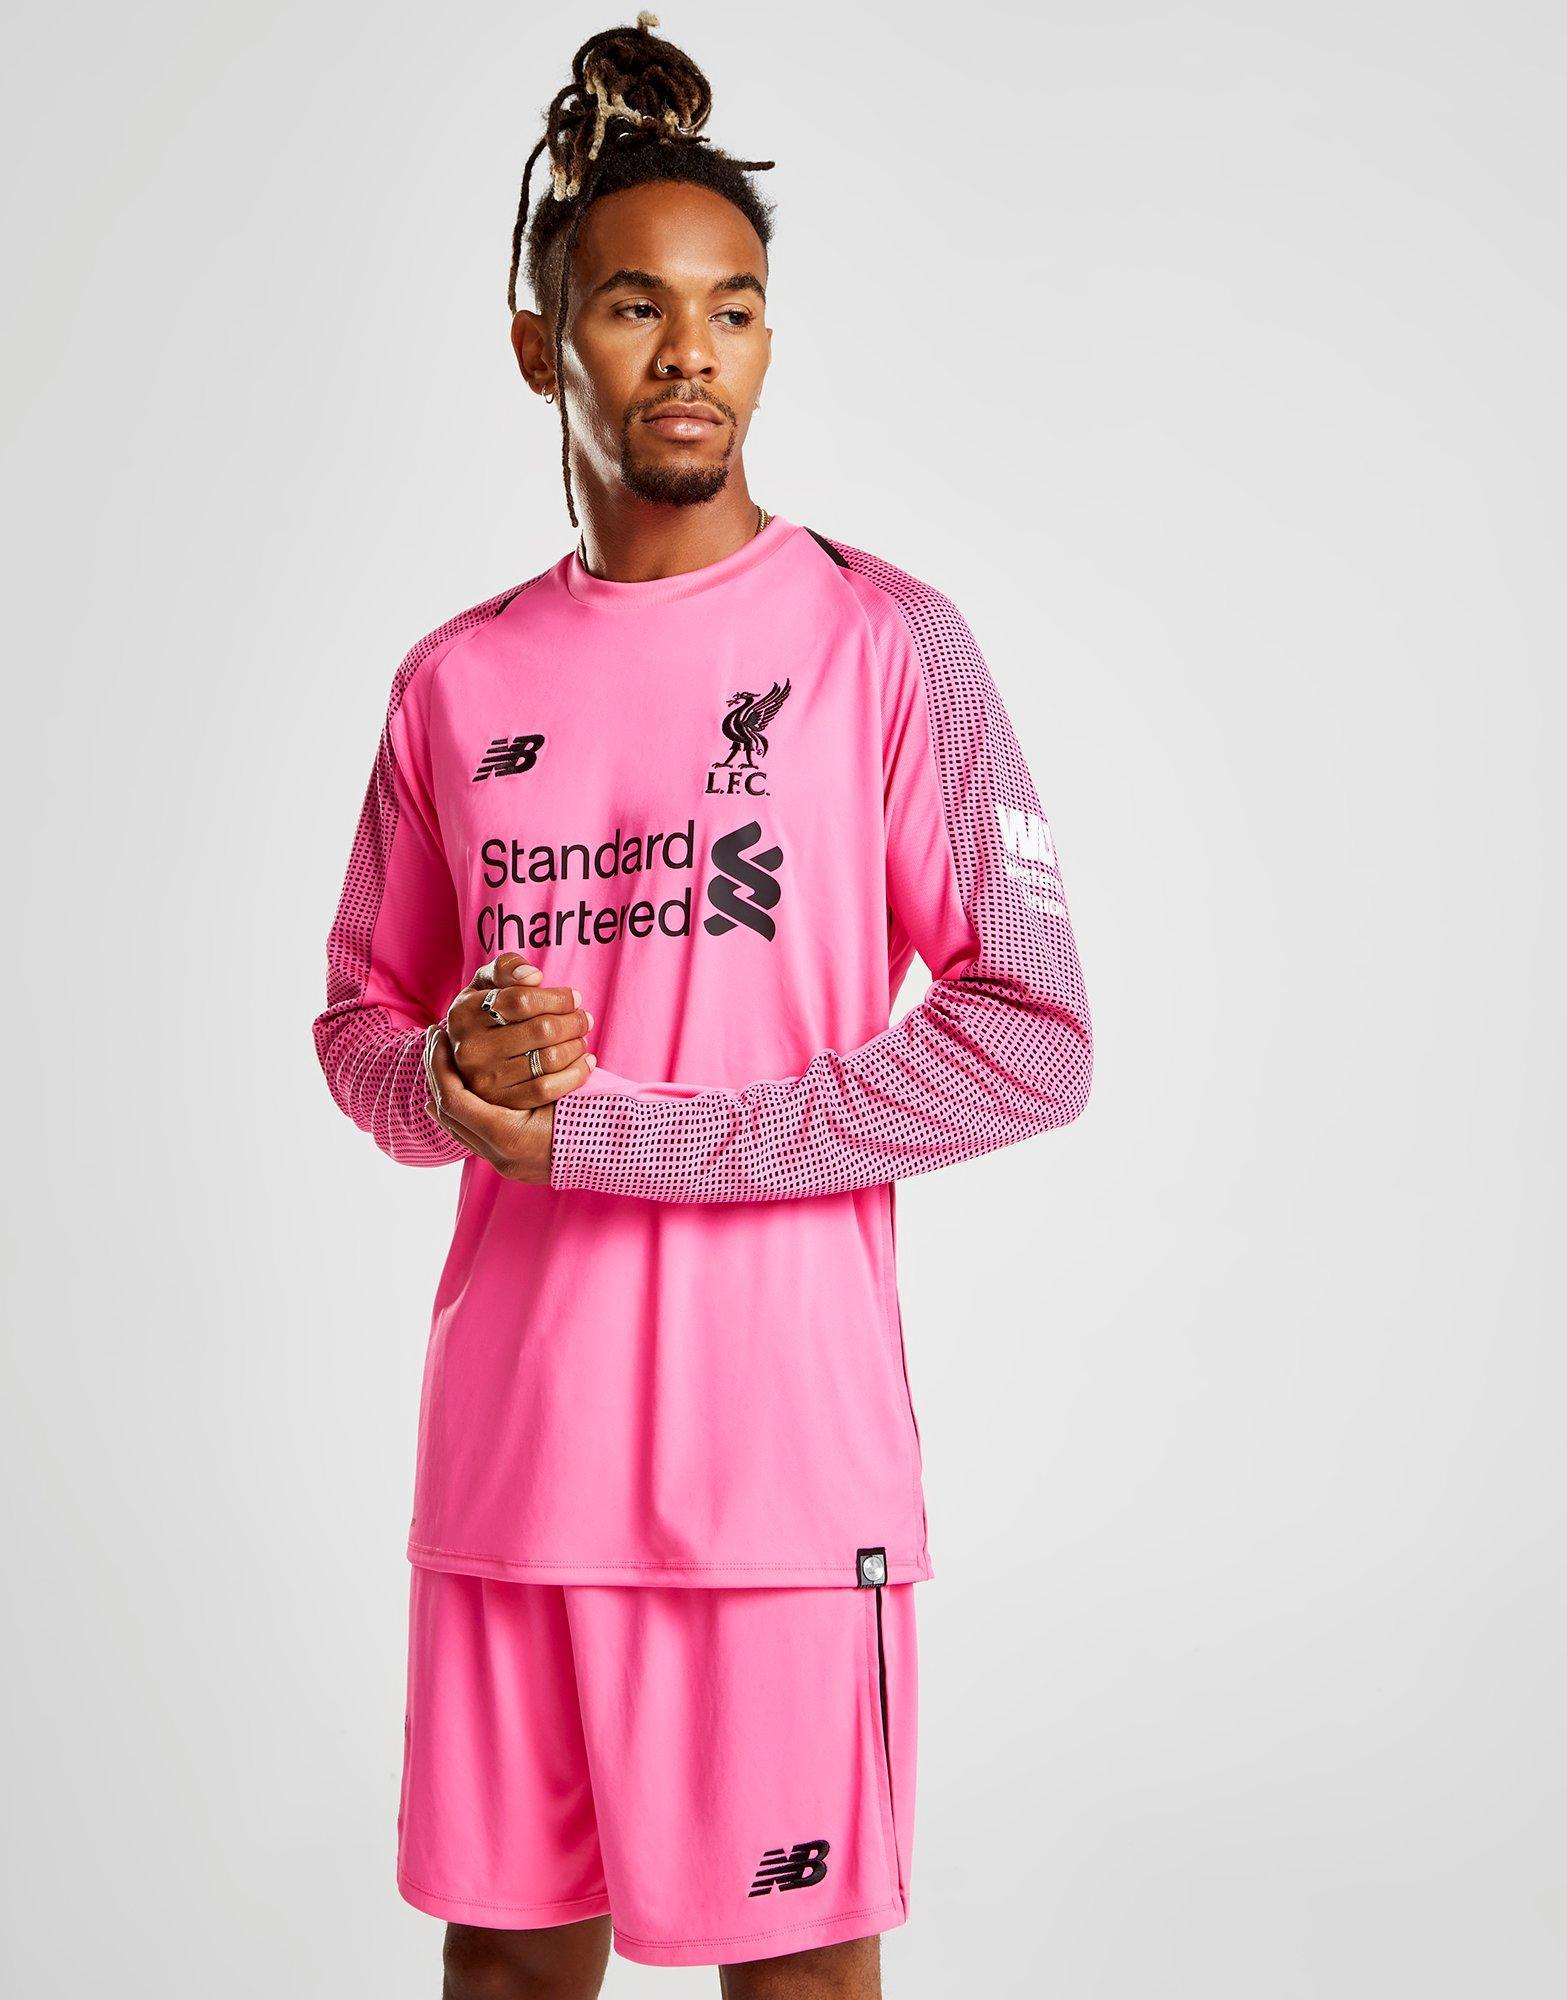 6e5b54e73 New Balance Liverpool Fc 2018 19 Third Goalkeeper Shirt in Pink for ...